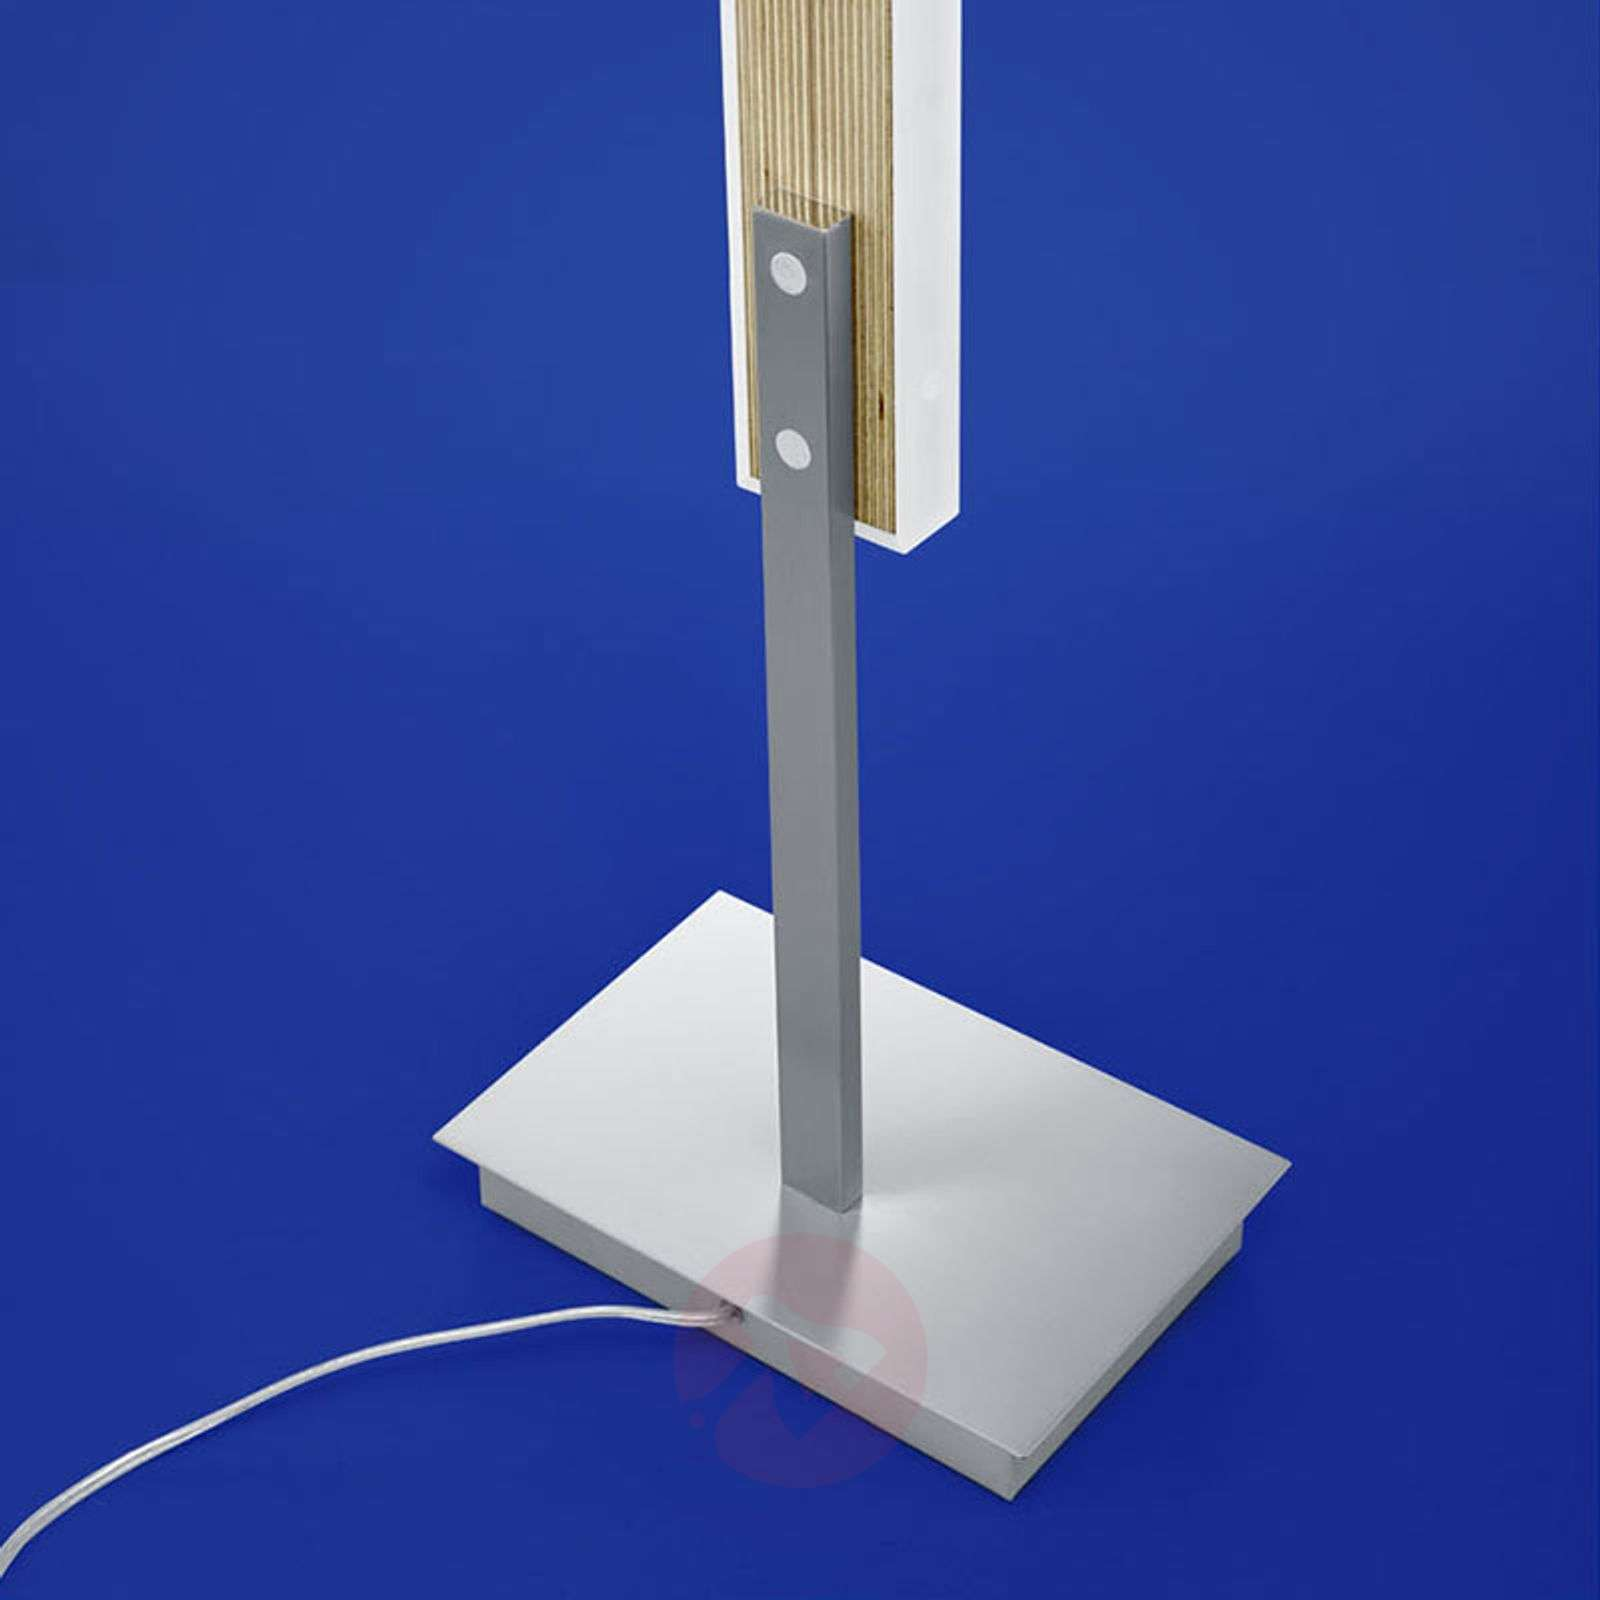 LED-lattiavalo Kiruna Wood liikehimmentimellä-1554074-01